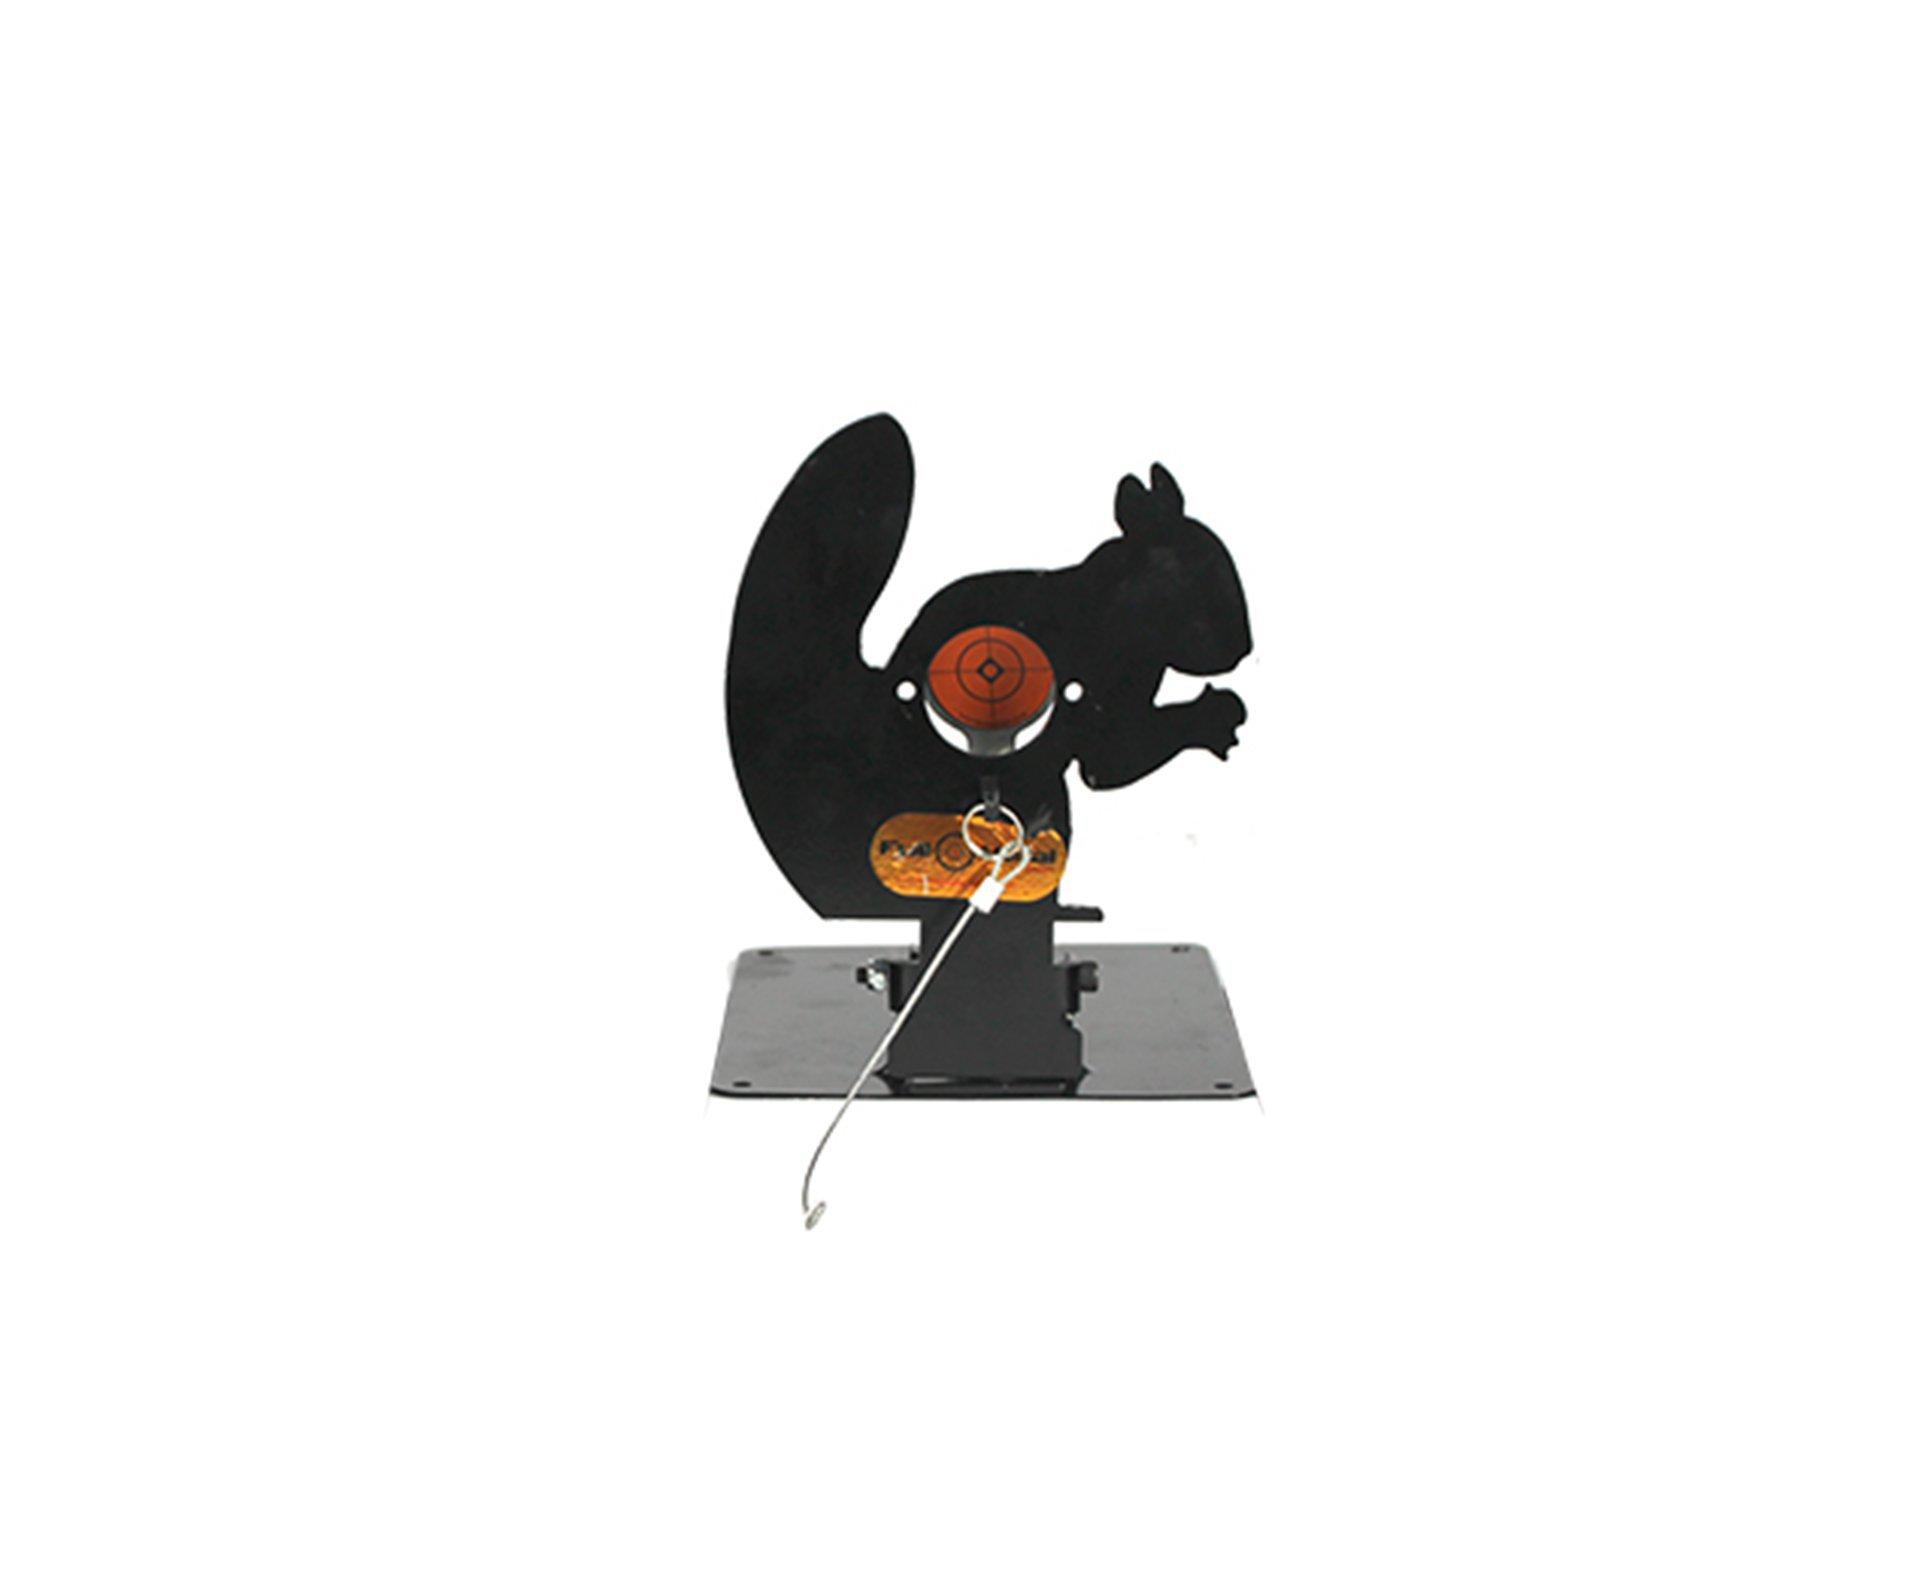 Alvo - Field Target Esquilo - Tam. Big - Full Metal